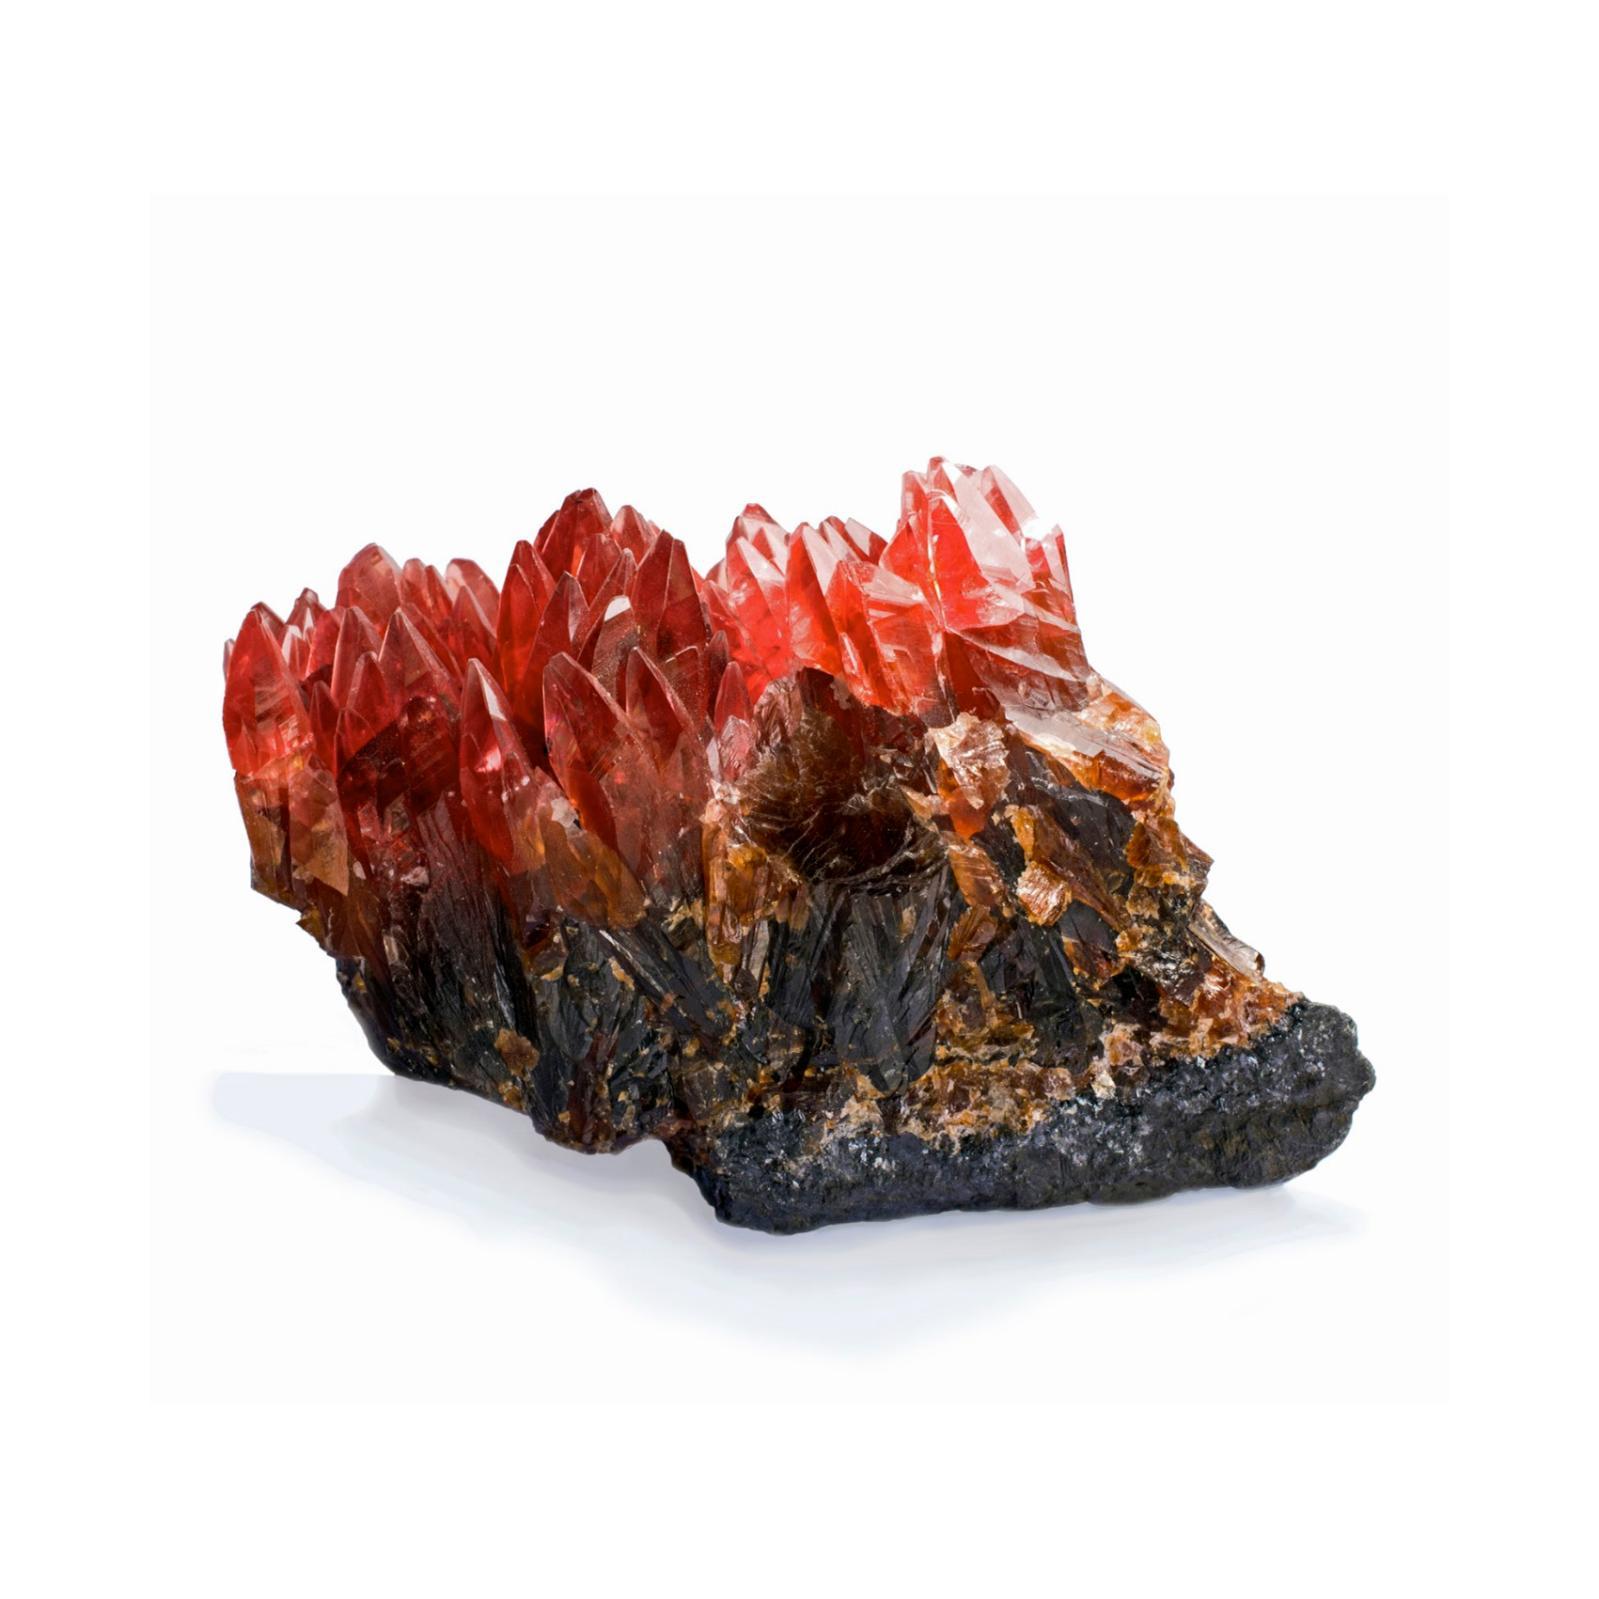 15312€ Rhodochrosite de Hotazel/N'Chwanning (mines de Kalahari, Afrique du Sud), 8x5,5x6cm. Paris, salle Rossini, 21octobre 2017.